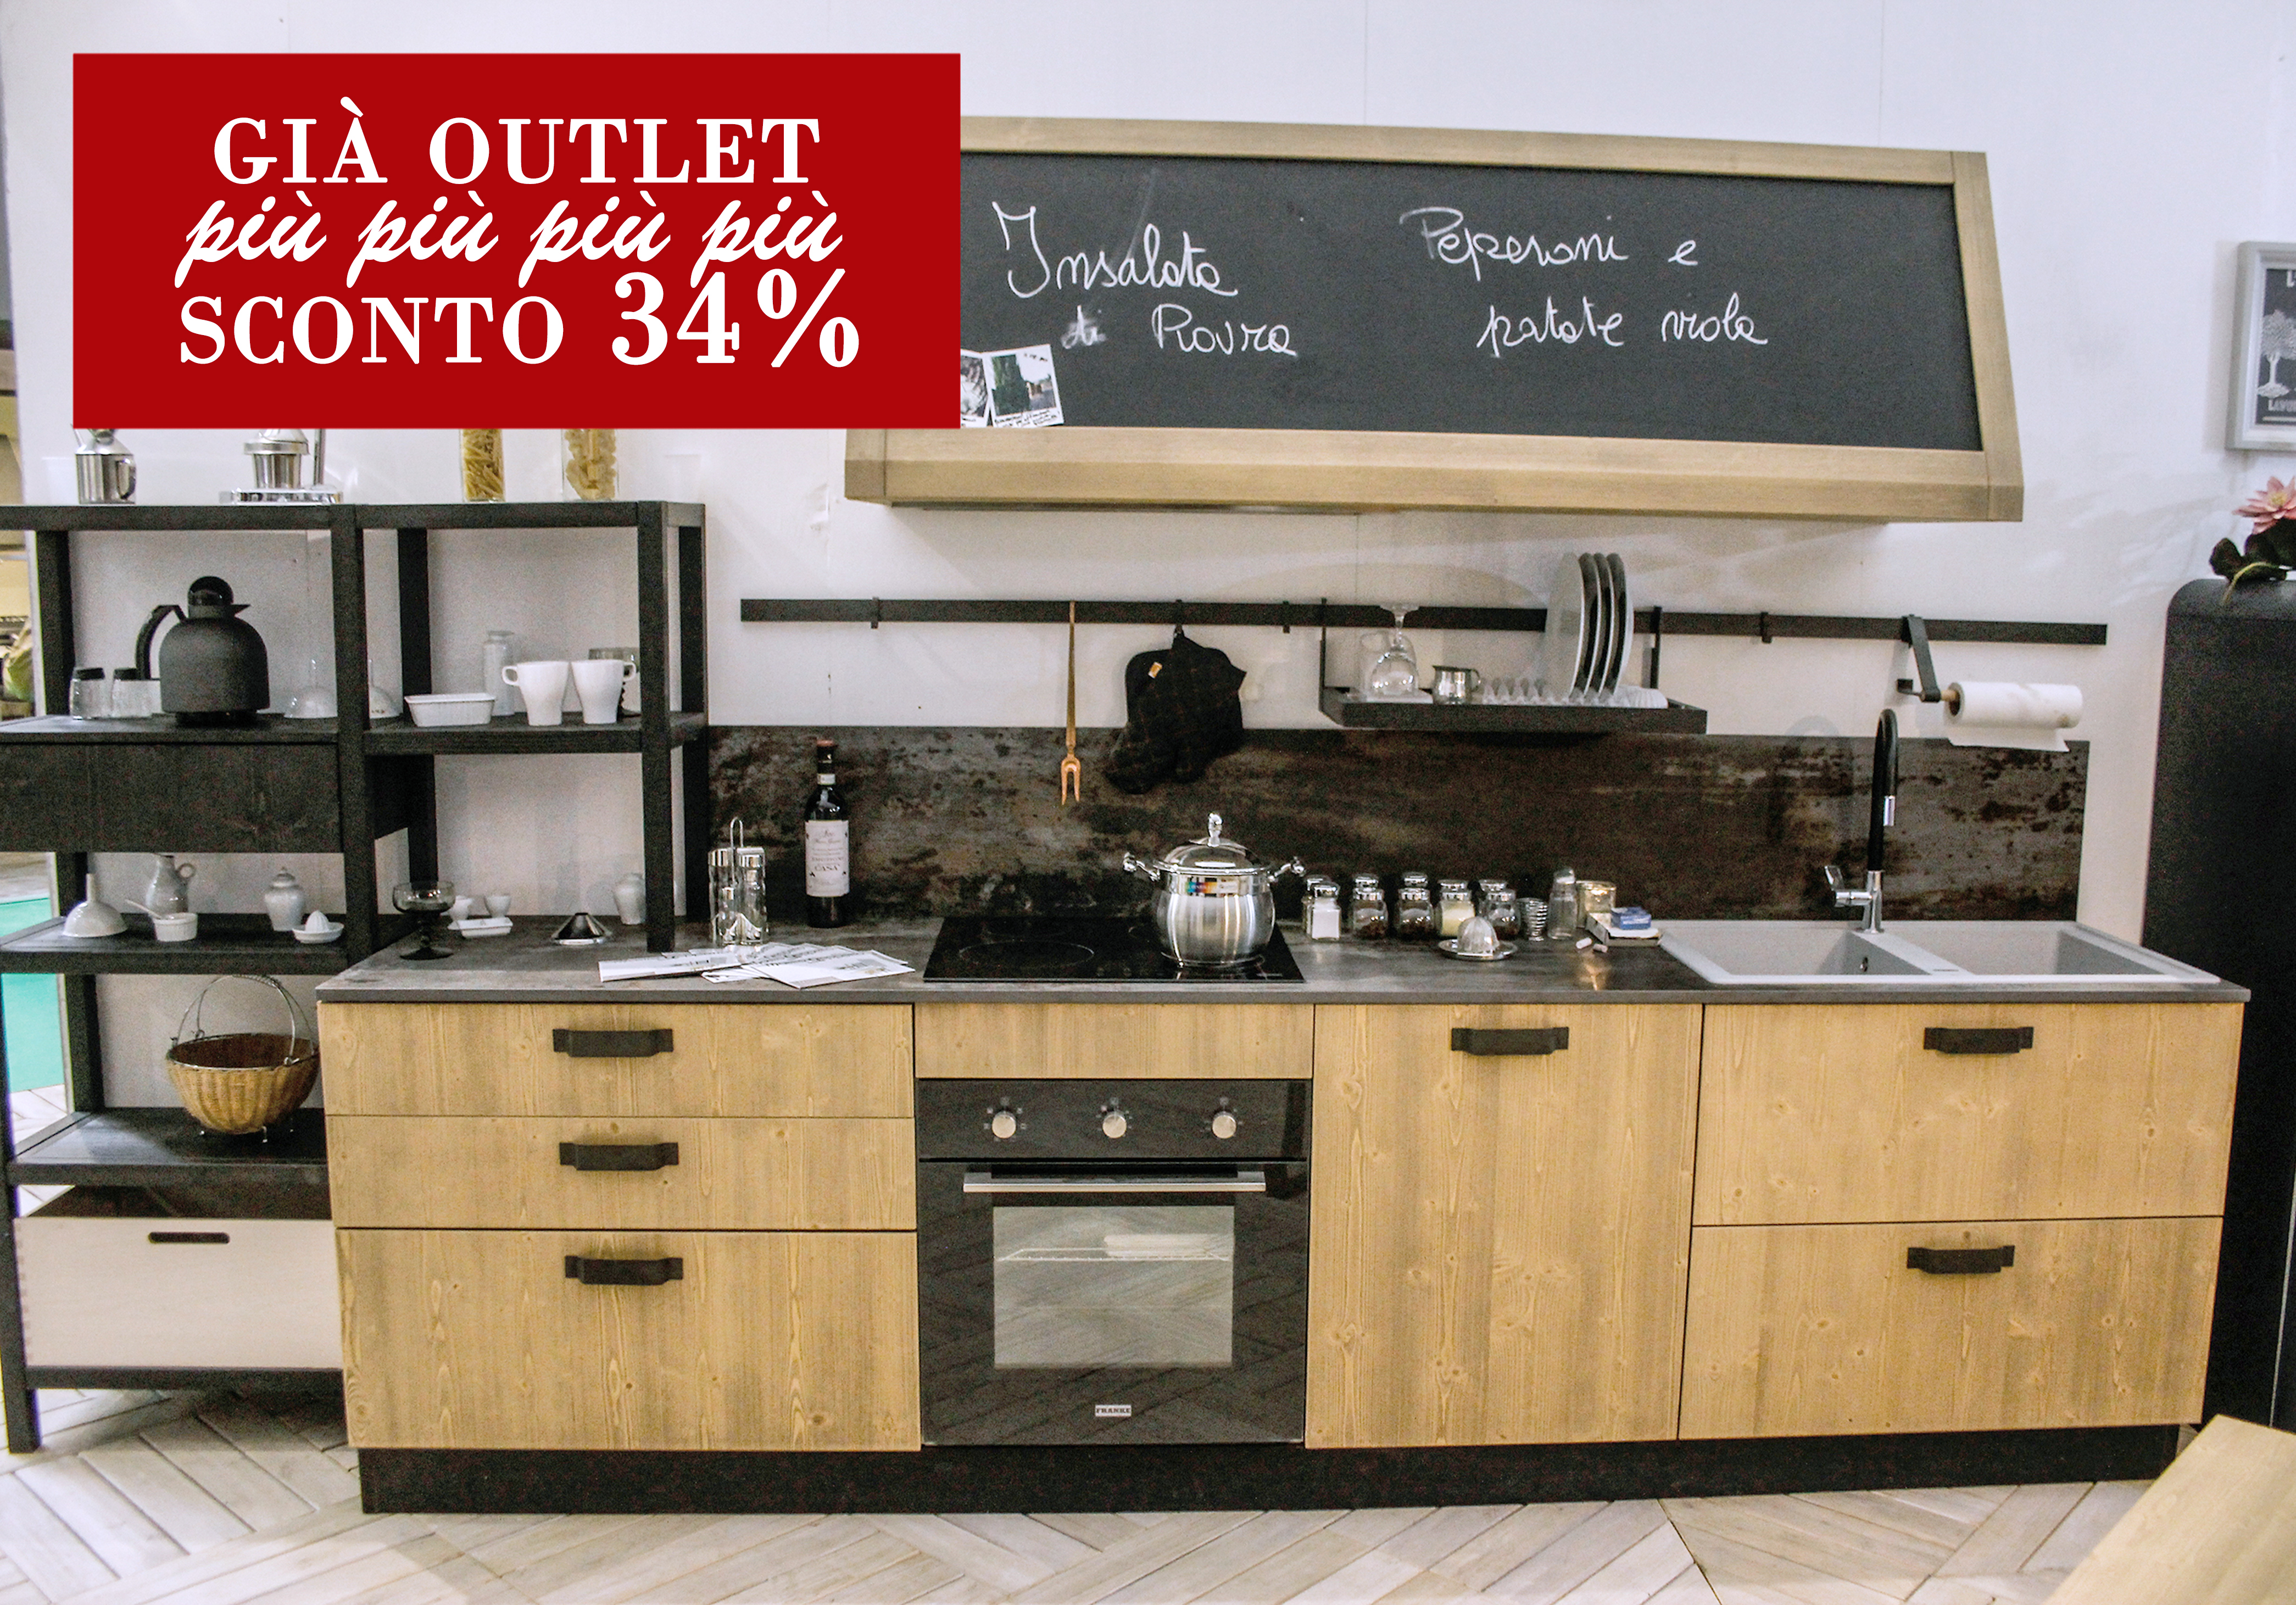 SCONTO -34% CUCINE MODERNE | iNobili Casa - Cucine su misura ...